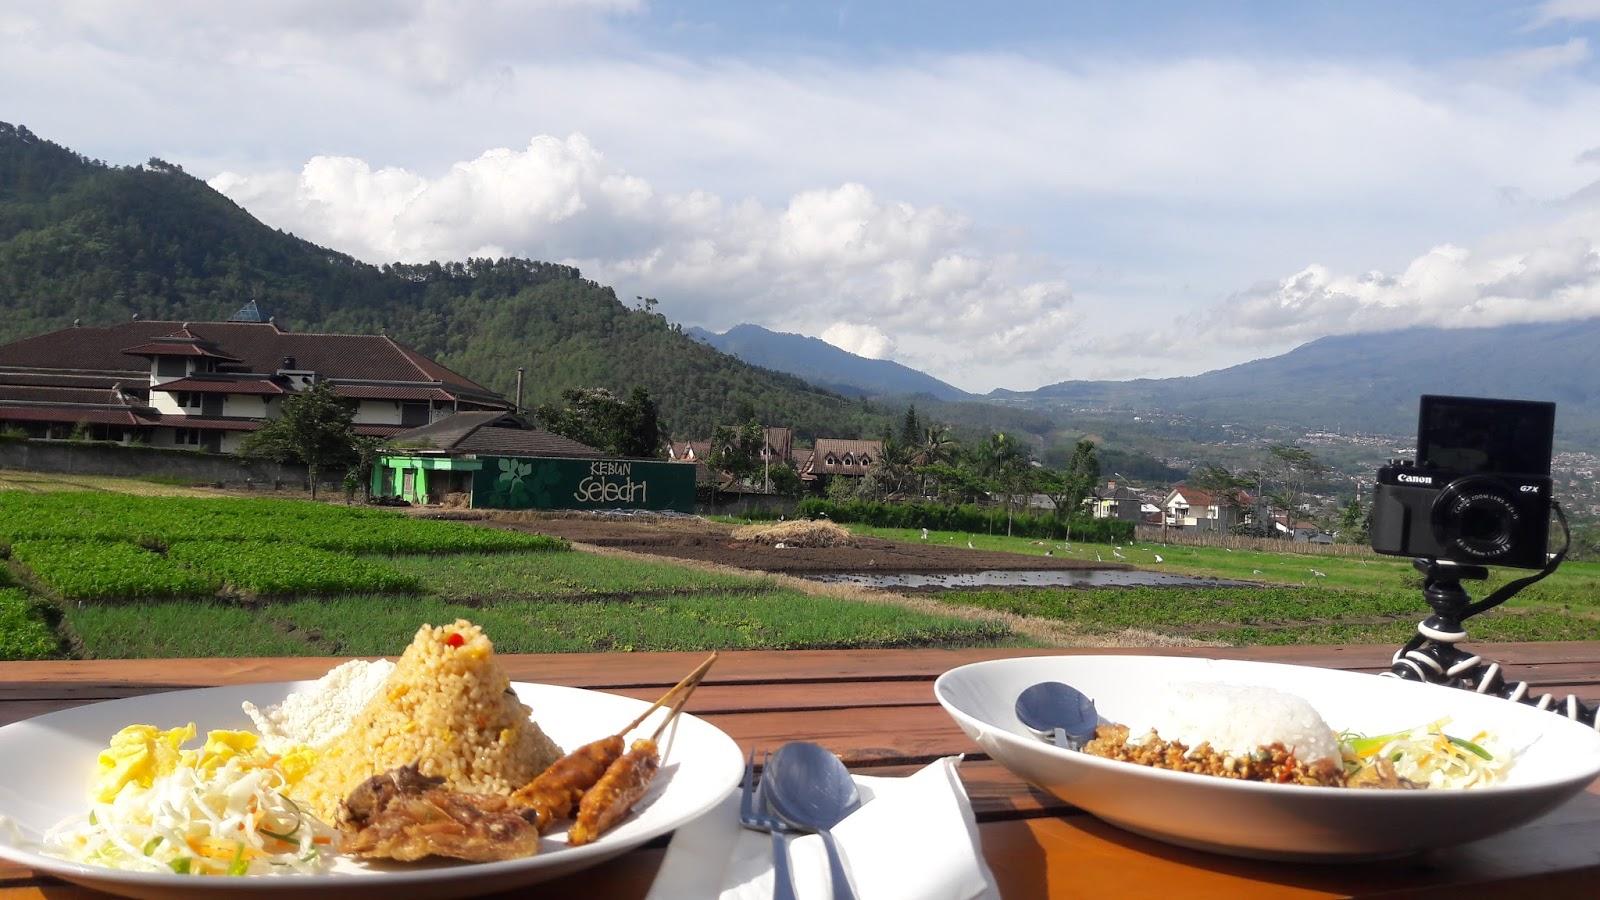 Cafe Pupuk Bawang Kota Batu View Alami Pegunungan Blog